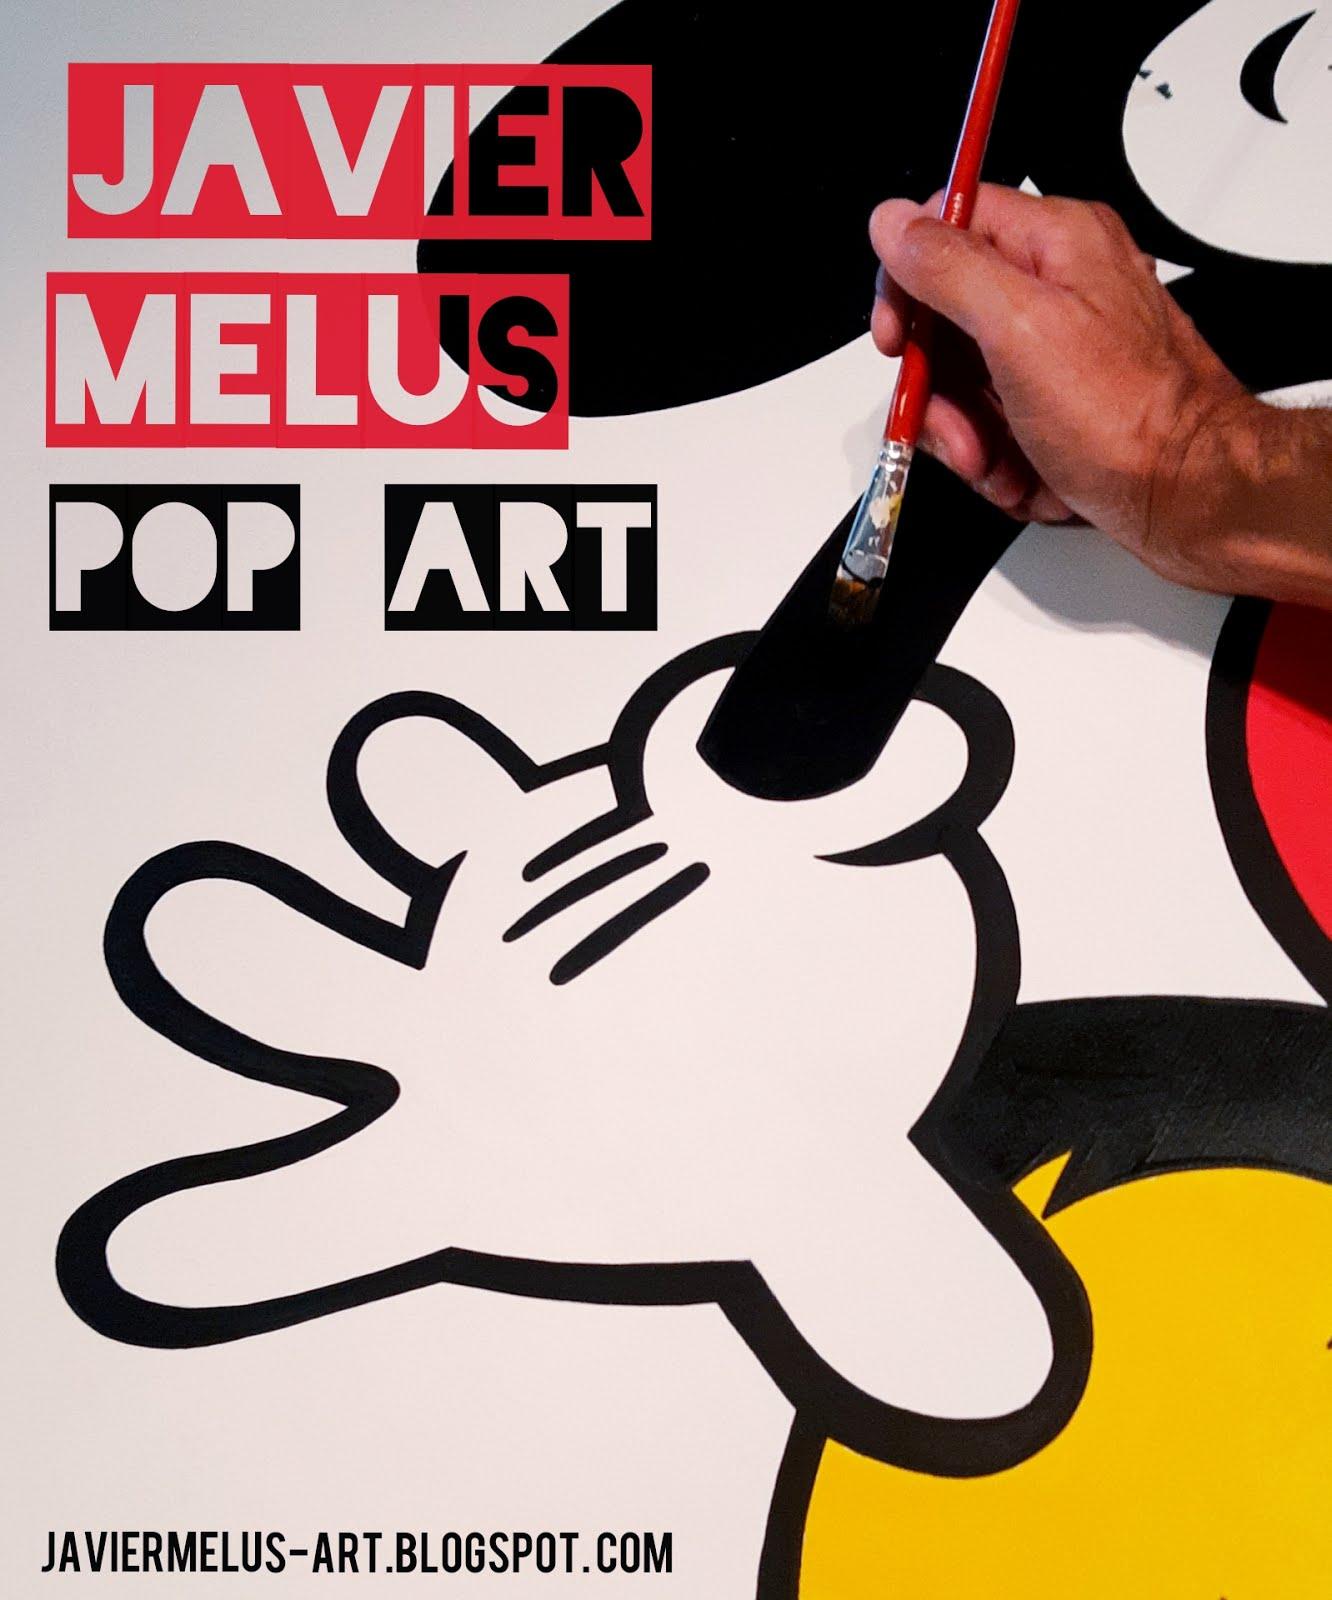 JAVIER MELUS POP ART